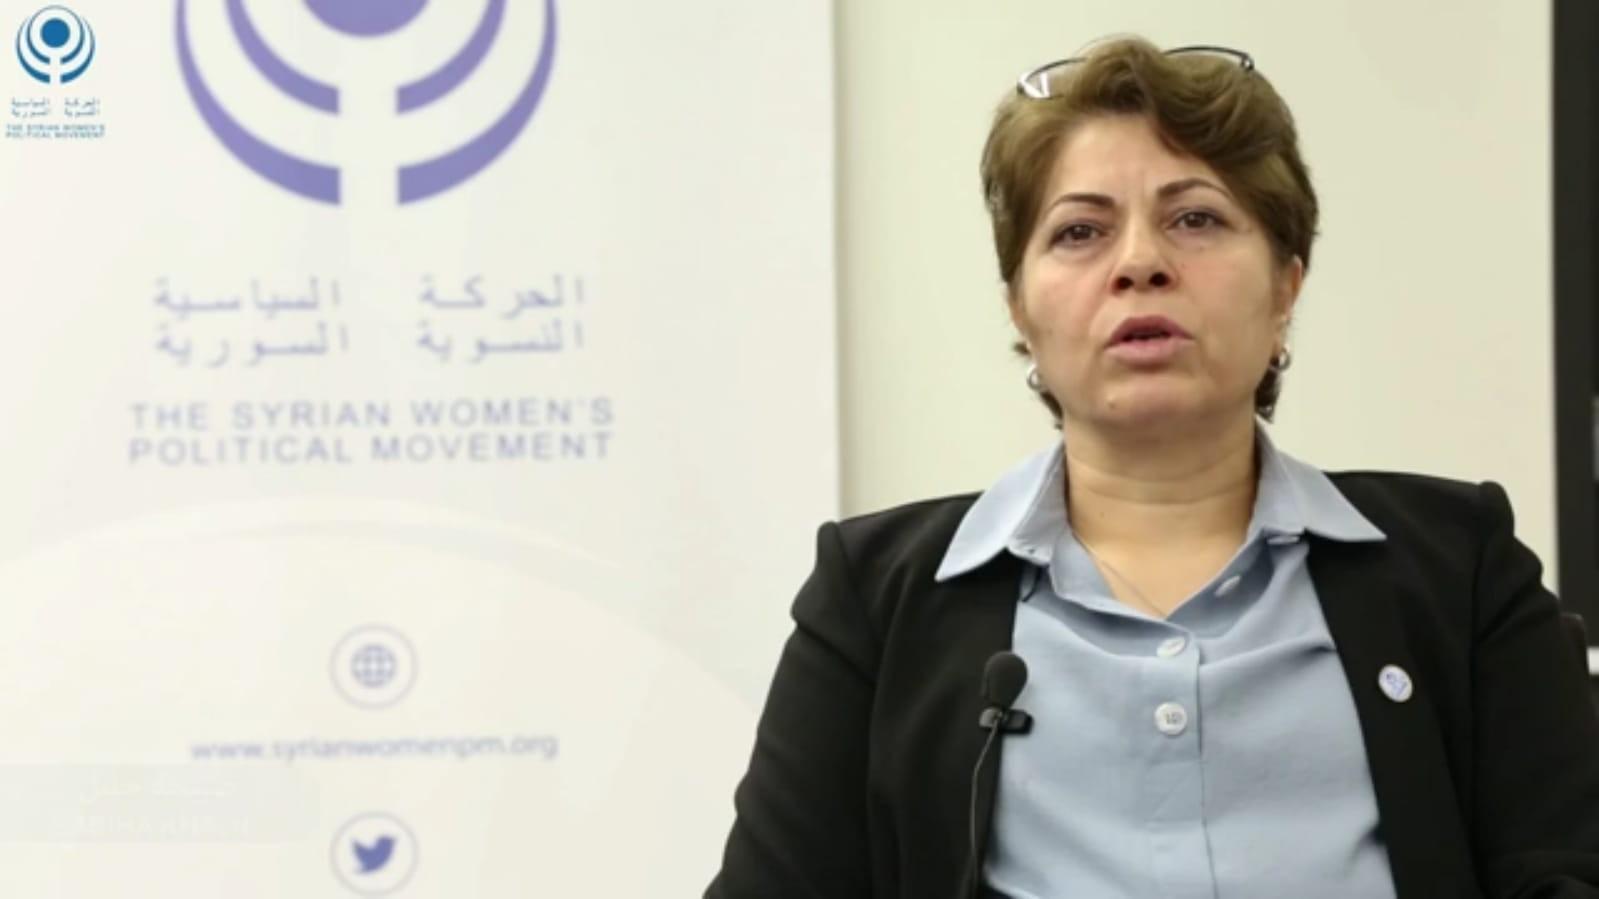 Sabiha Khalil  The Syrian Women's Political Movement Member